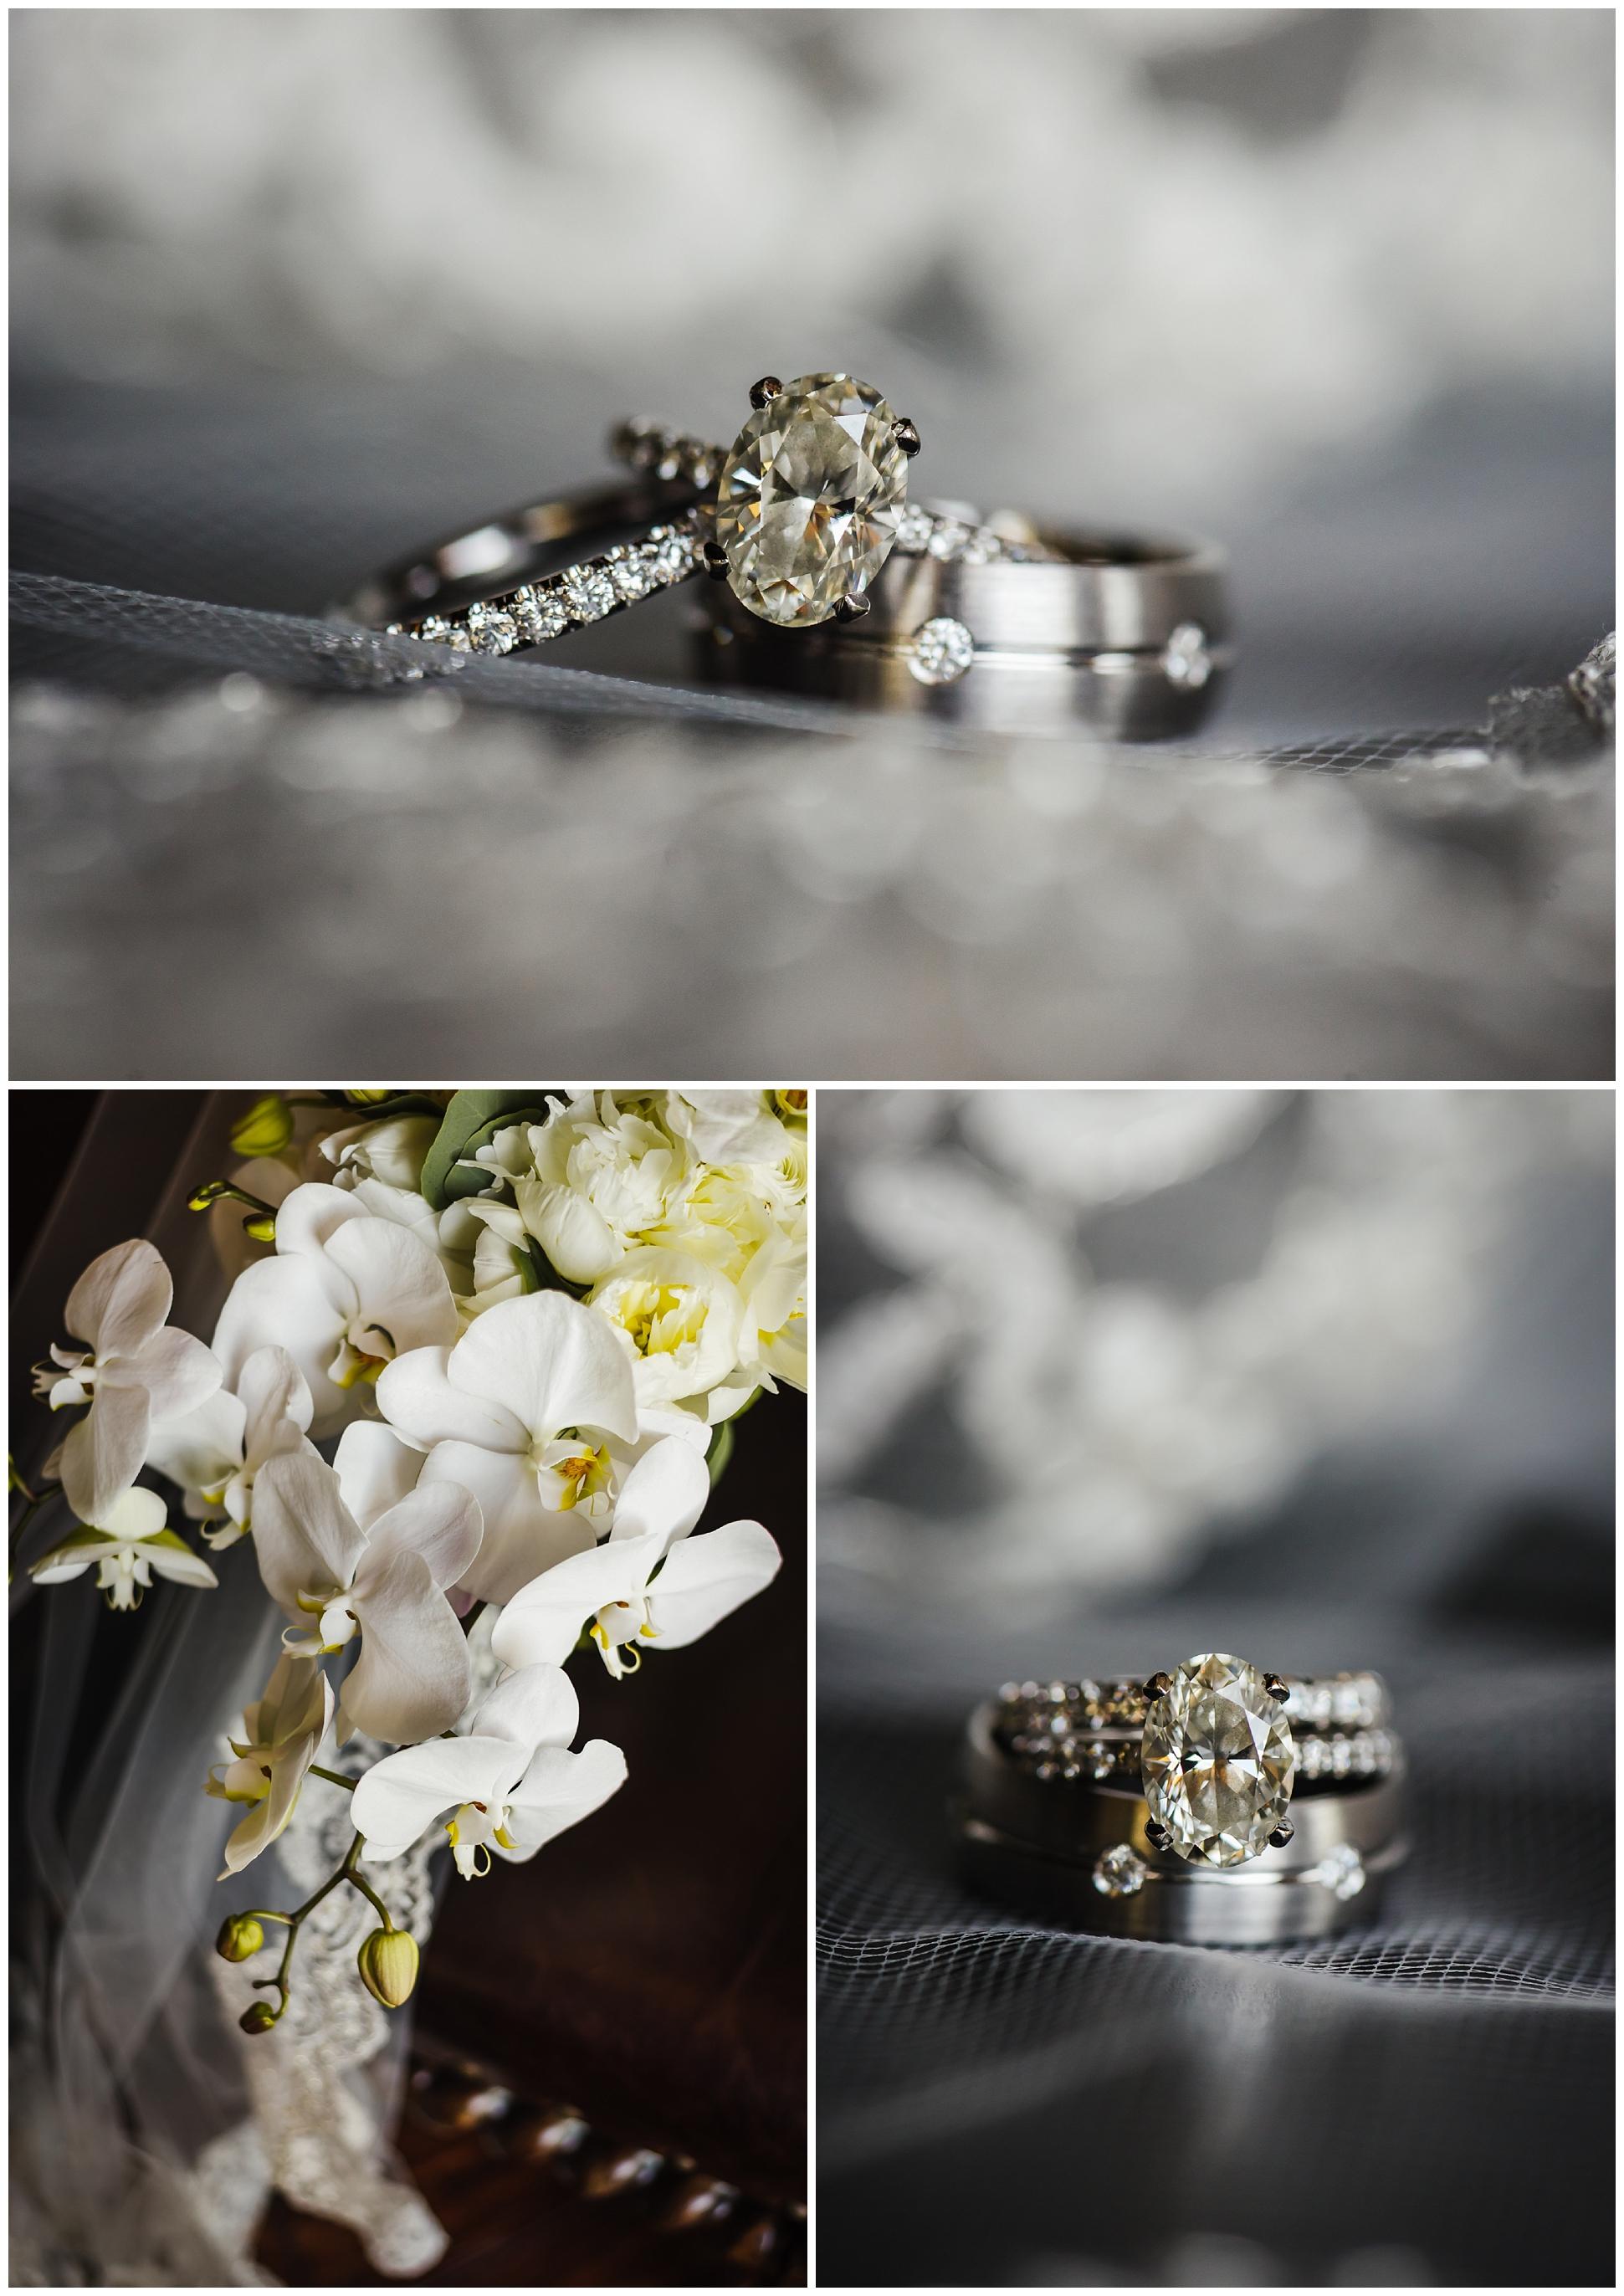 Tampa-luxury-wedding-photographer-mision-lago-private-estate_0004.jpg